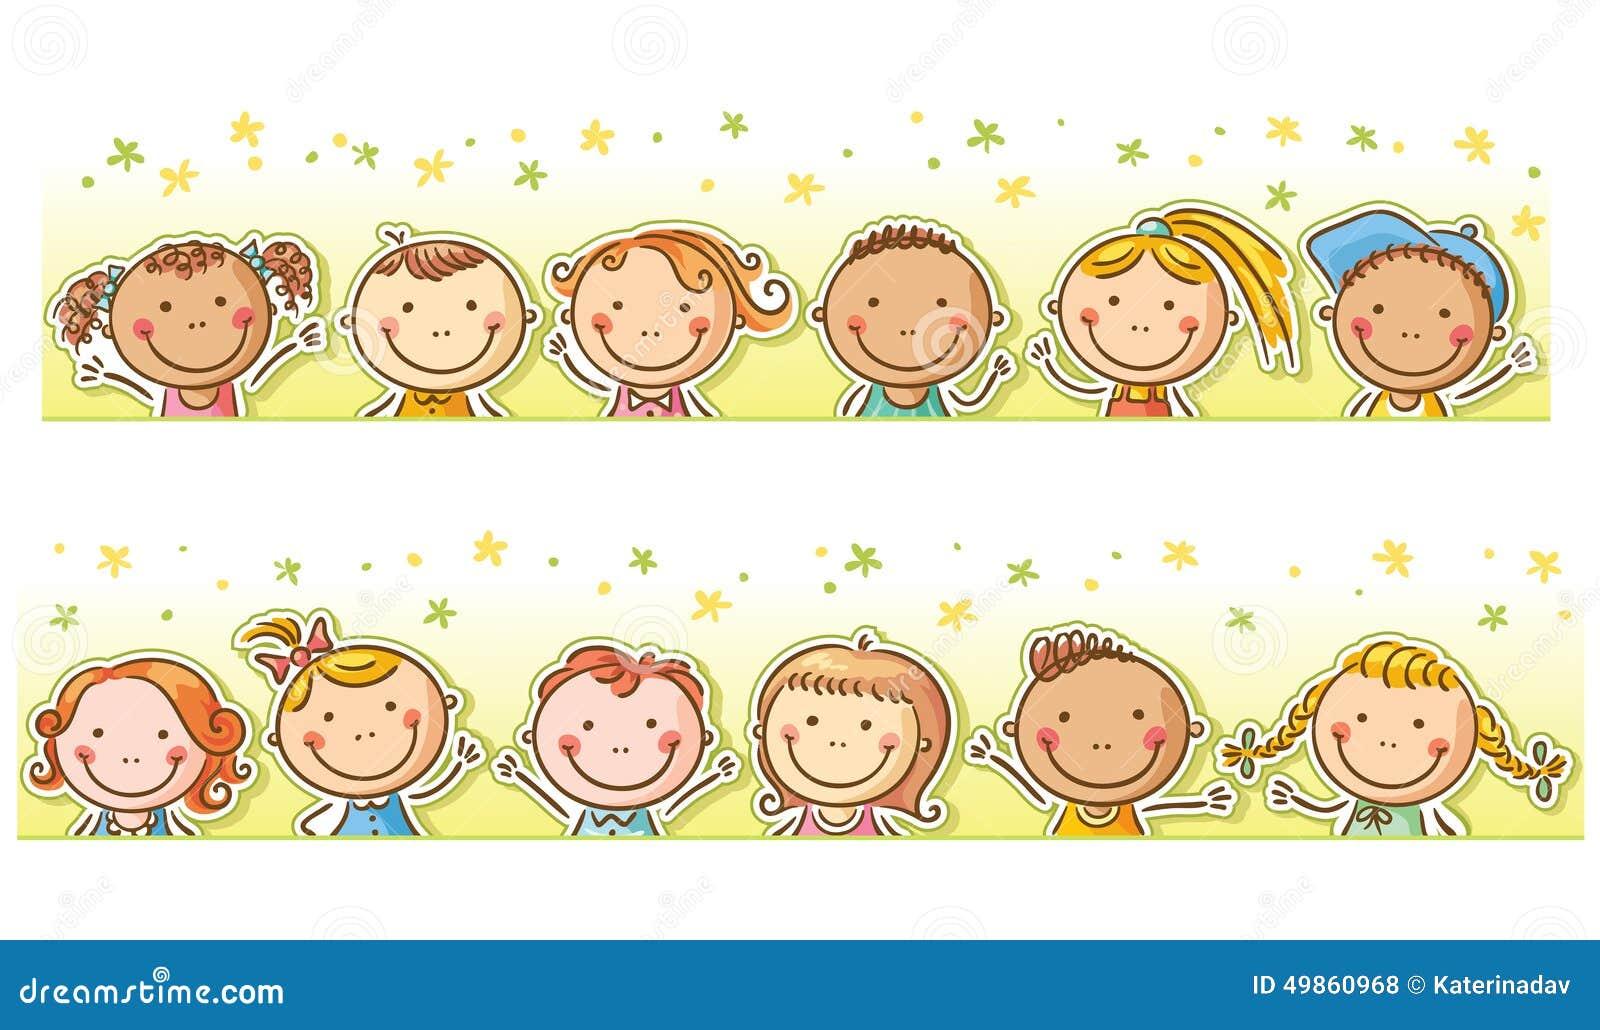 border with happy cartoon kids stock vector illustration fall border clip art free images Free Fall Border Clip Art Fancy